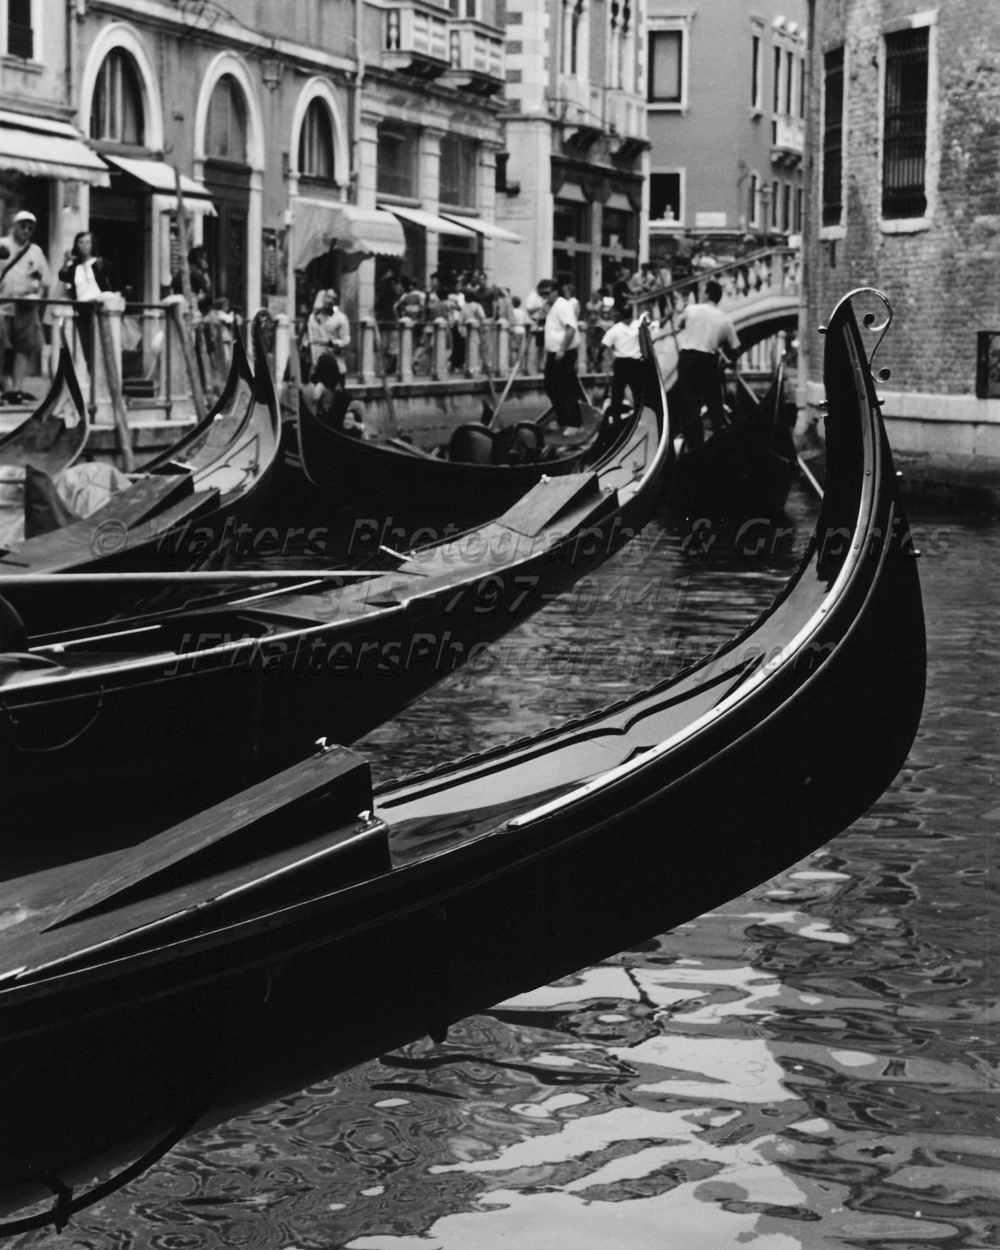 Gondolas_8156_20A.jpg